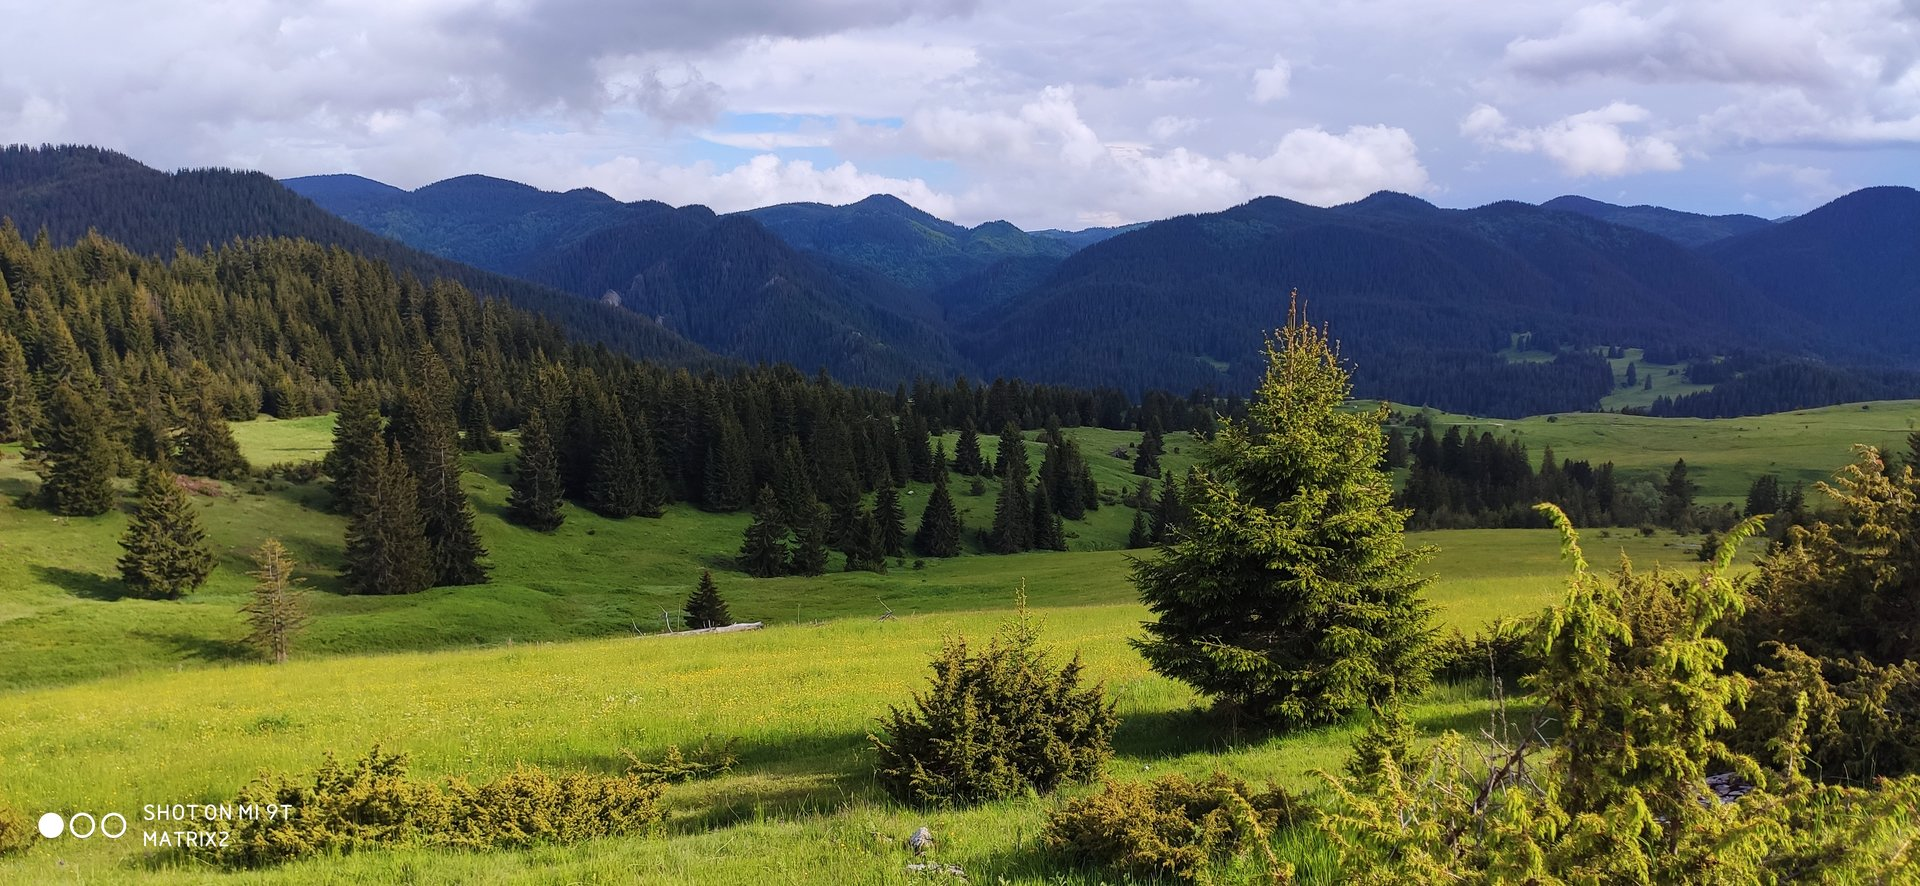 Някъде в Родопите | Author Martin Nikolov - martix | PHOTO FORUM